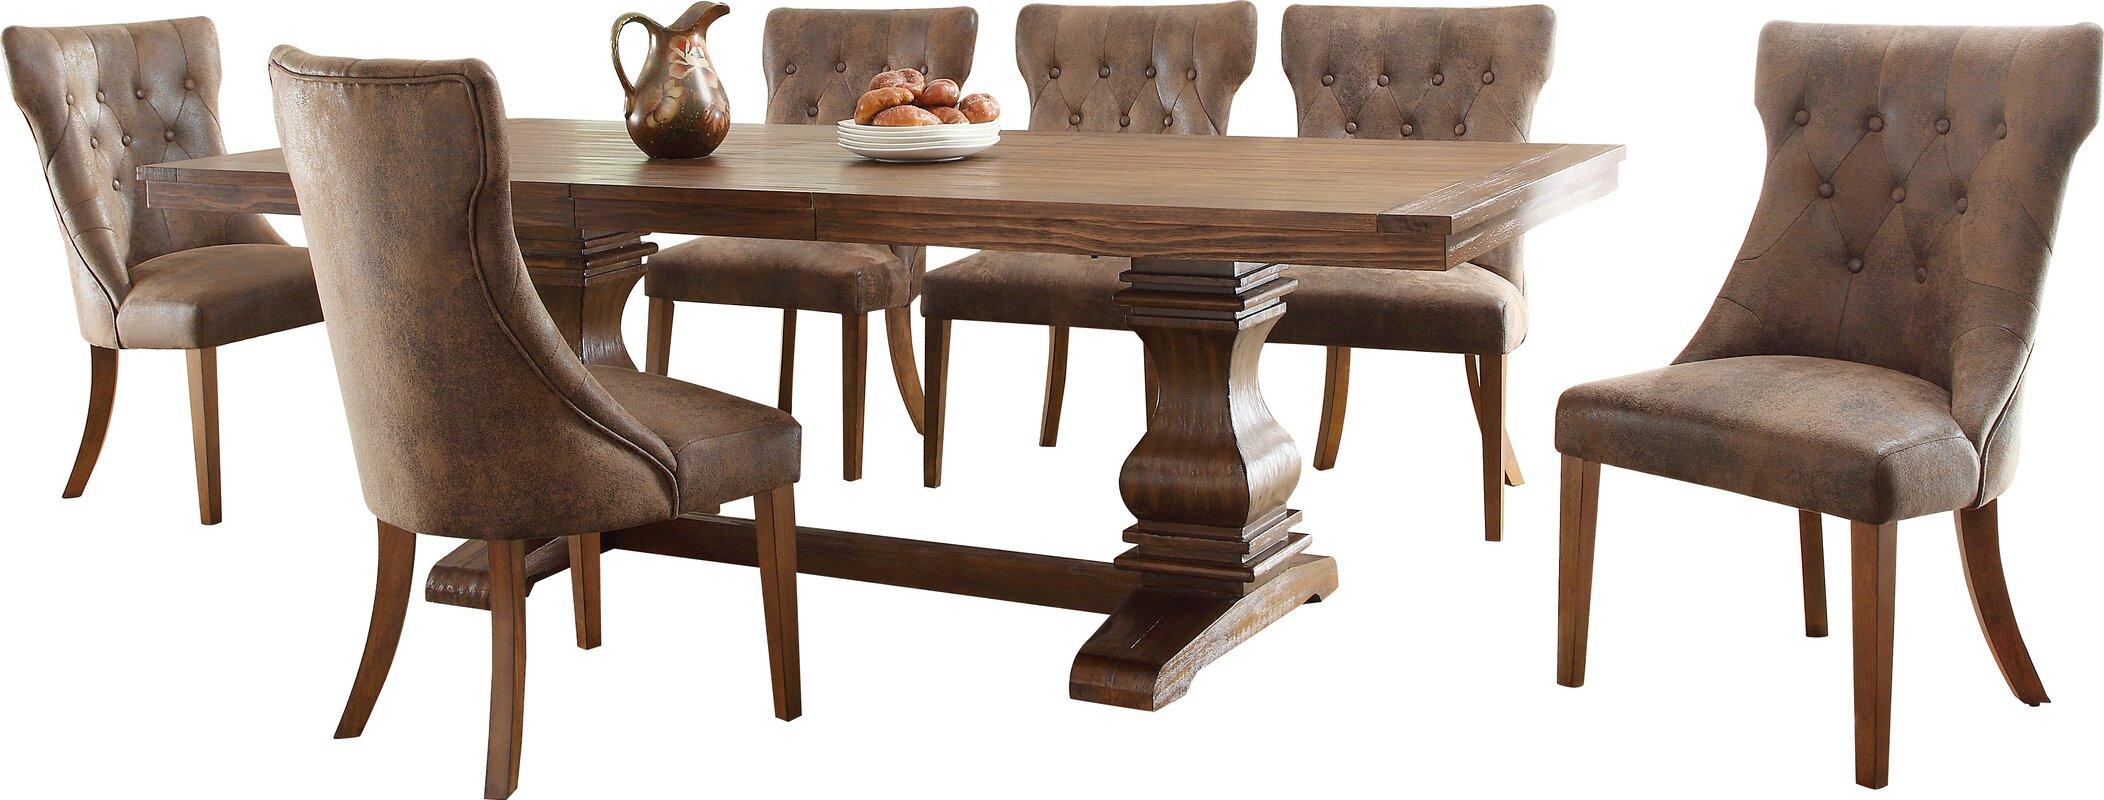 Parfondeval Extendable Wood Dining Table